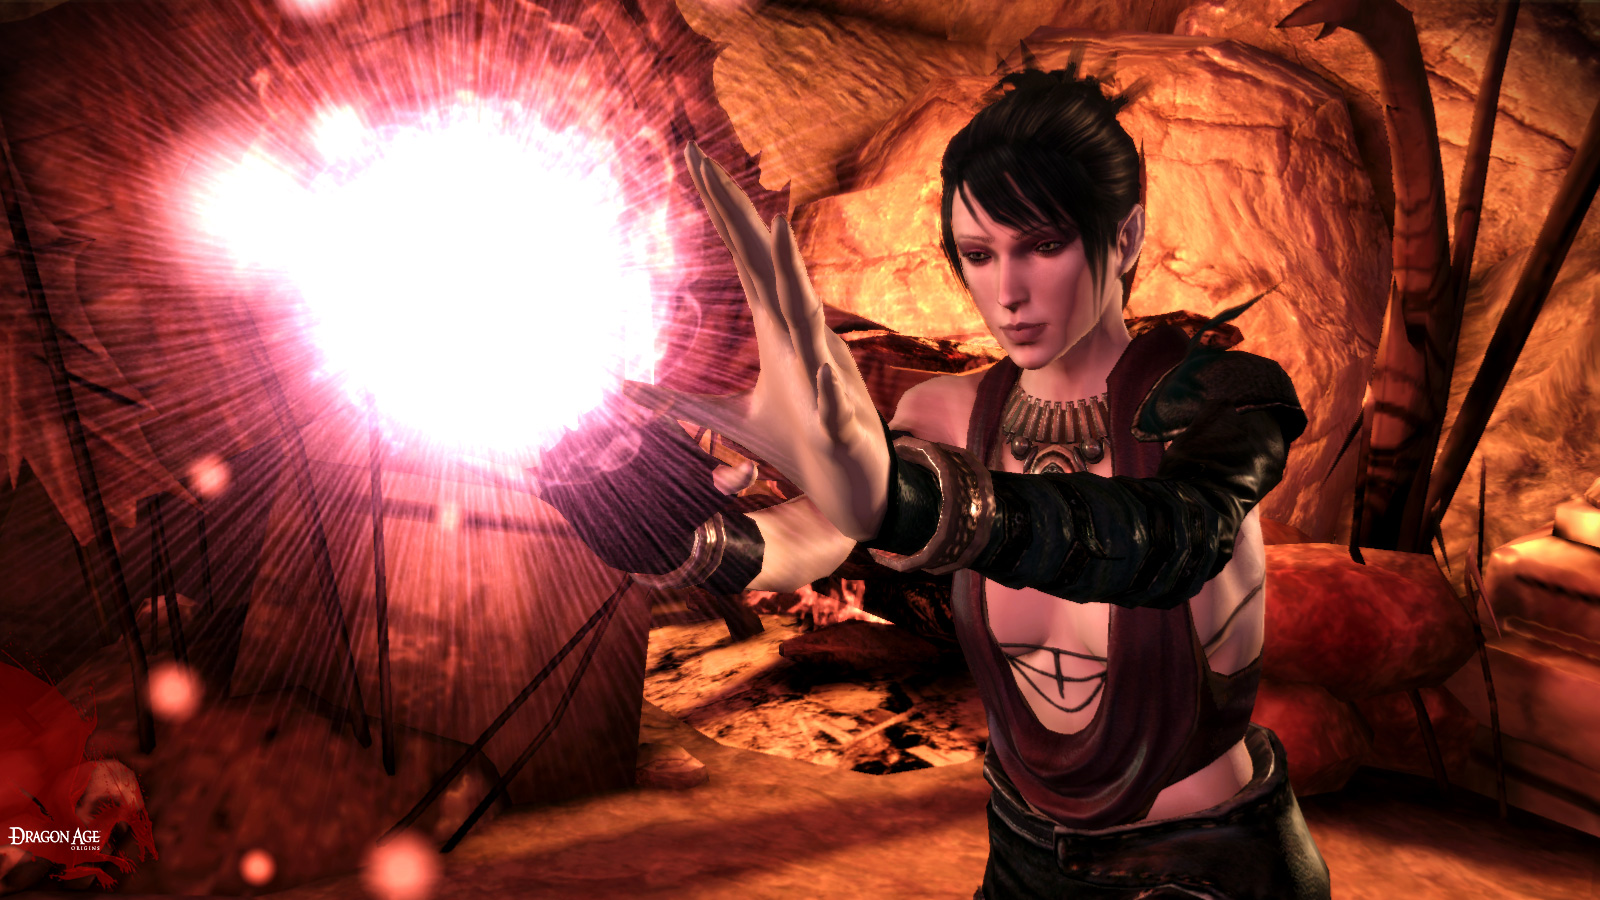 Dragon Age Начало - Персонажи - Морриган.